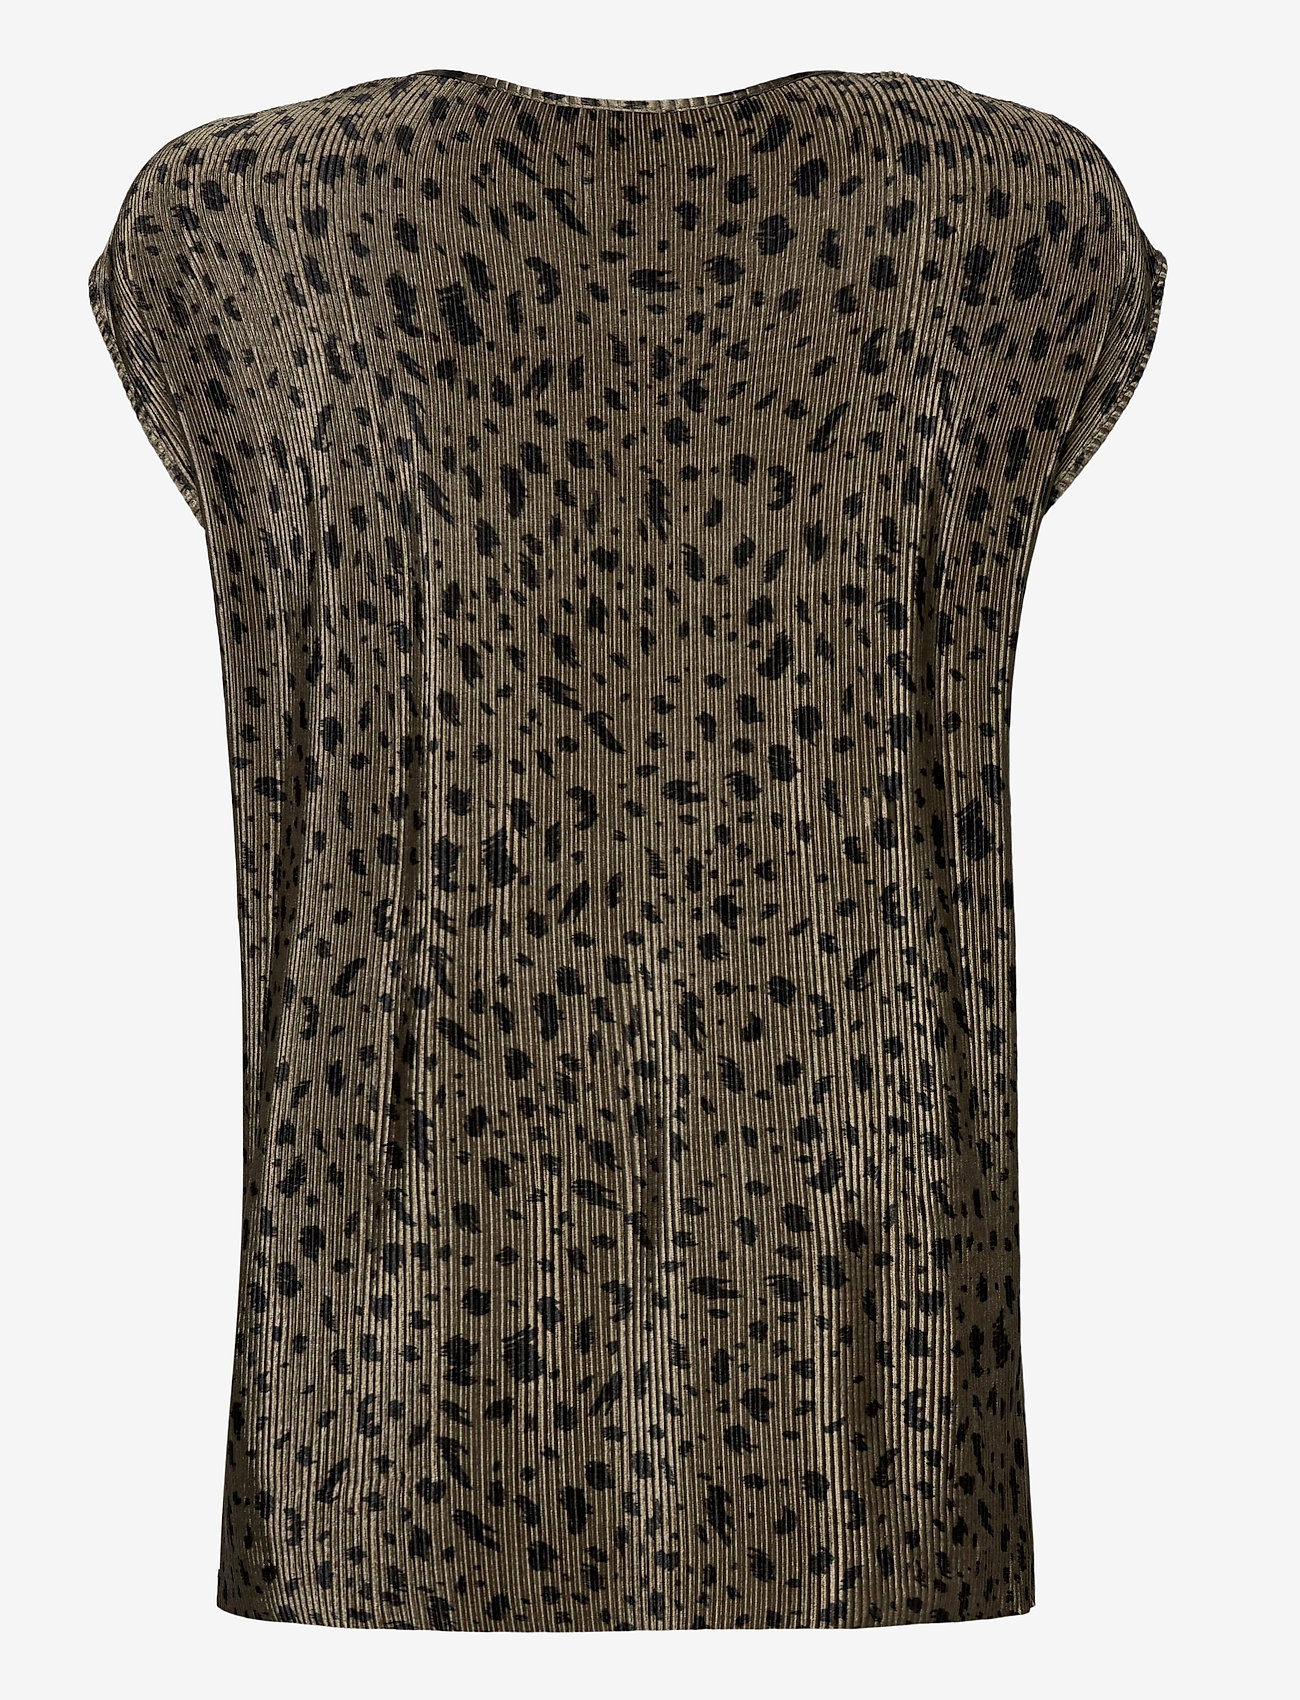 Soyaconcept - SC-OLINDA - short-sleeved blouses - dark army combi - 1